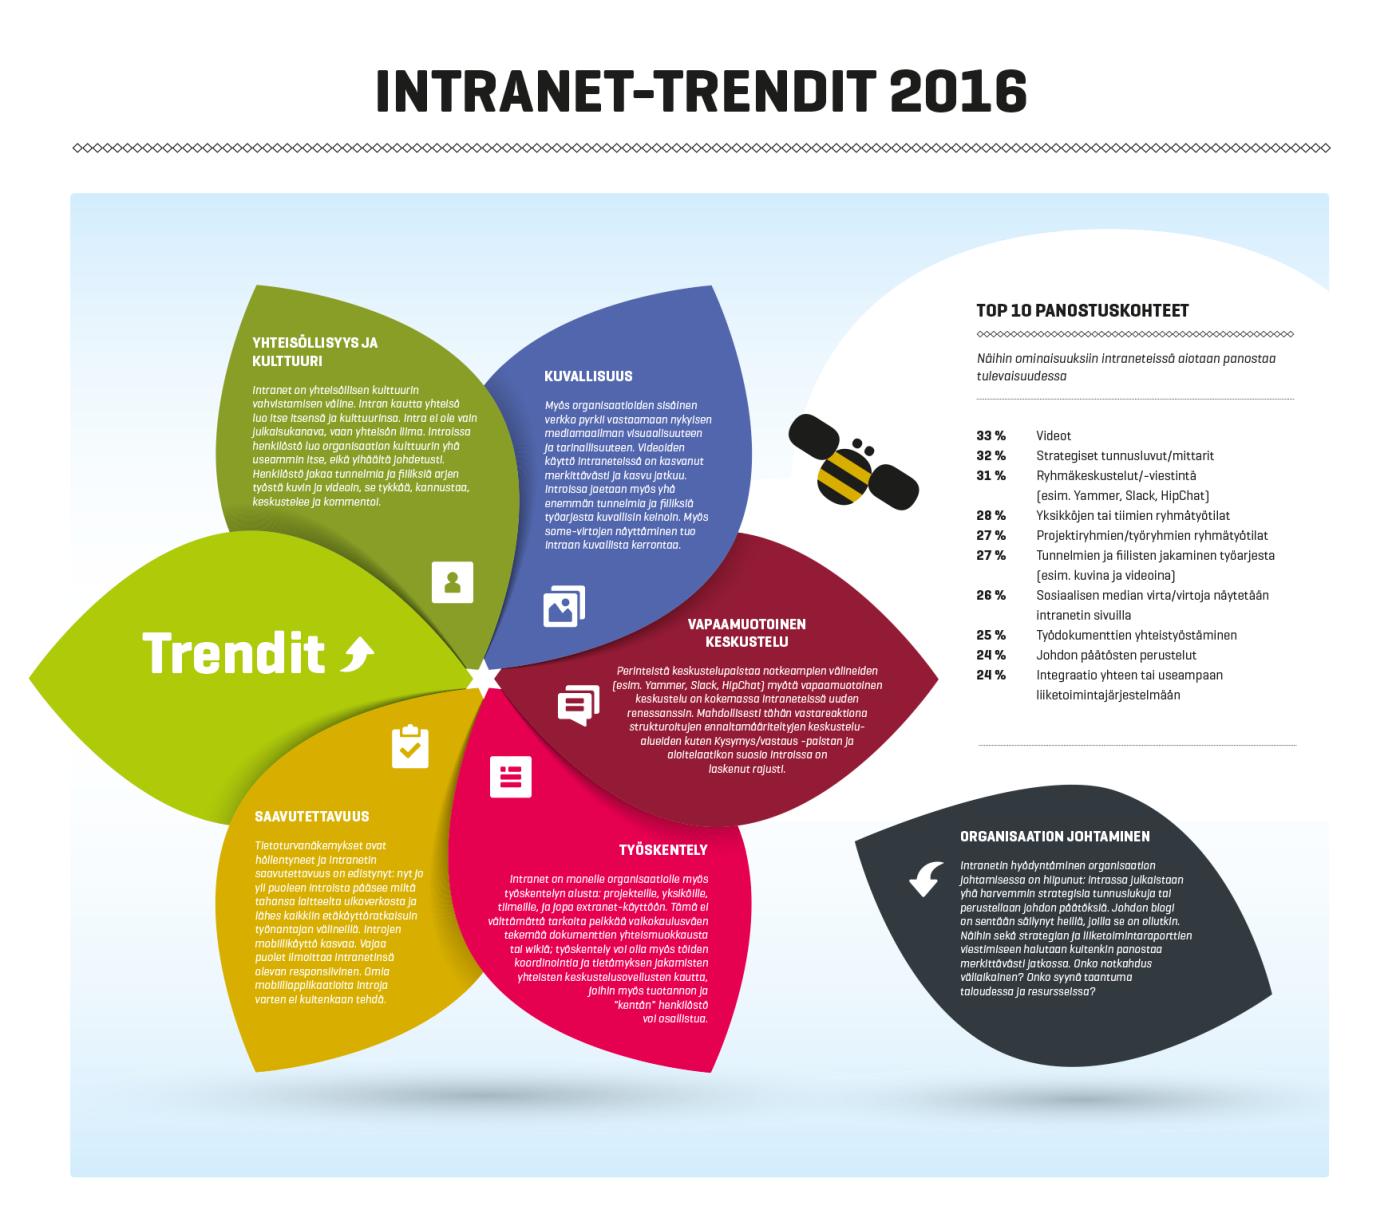 Intranet-palvelut Suomessa 2016: Intranet-trendit 2016